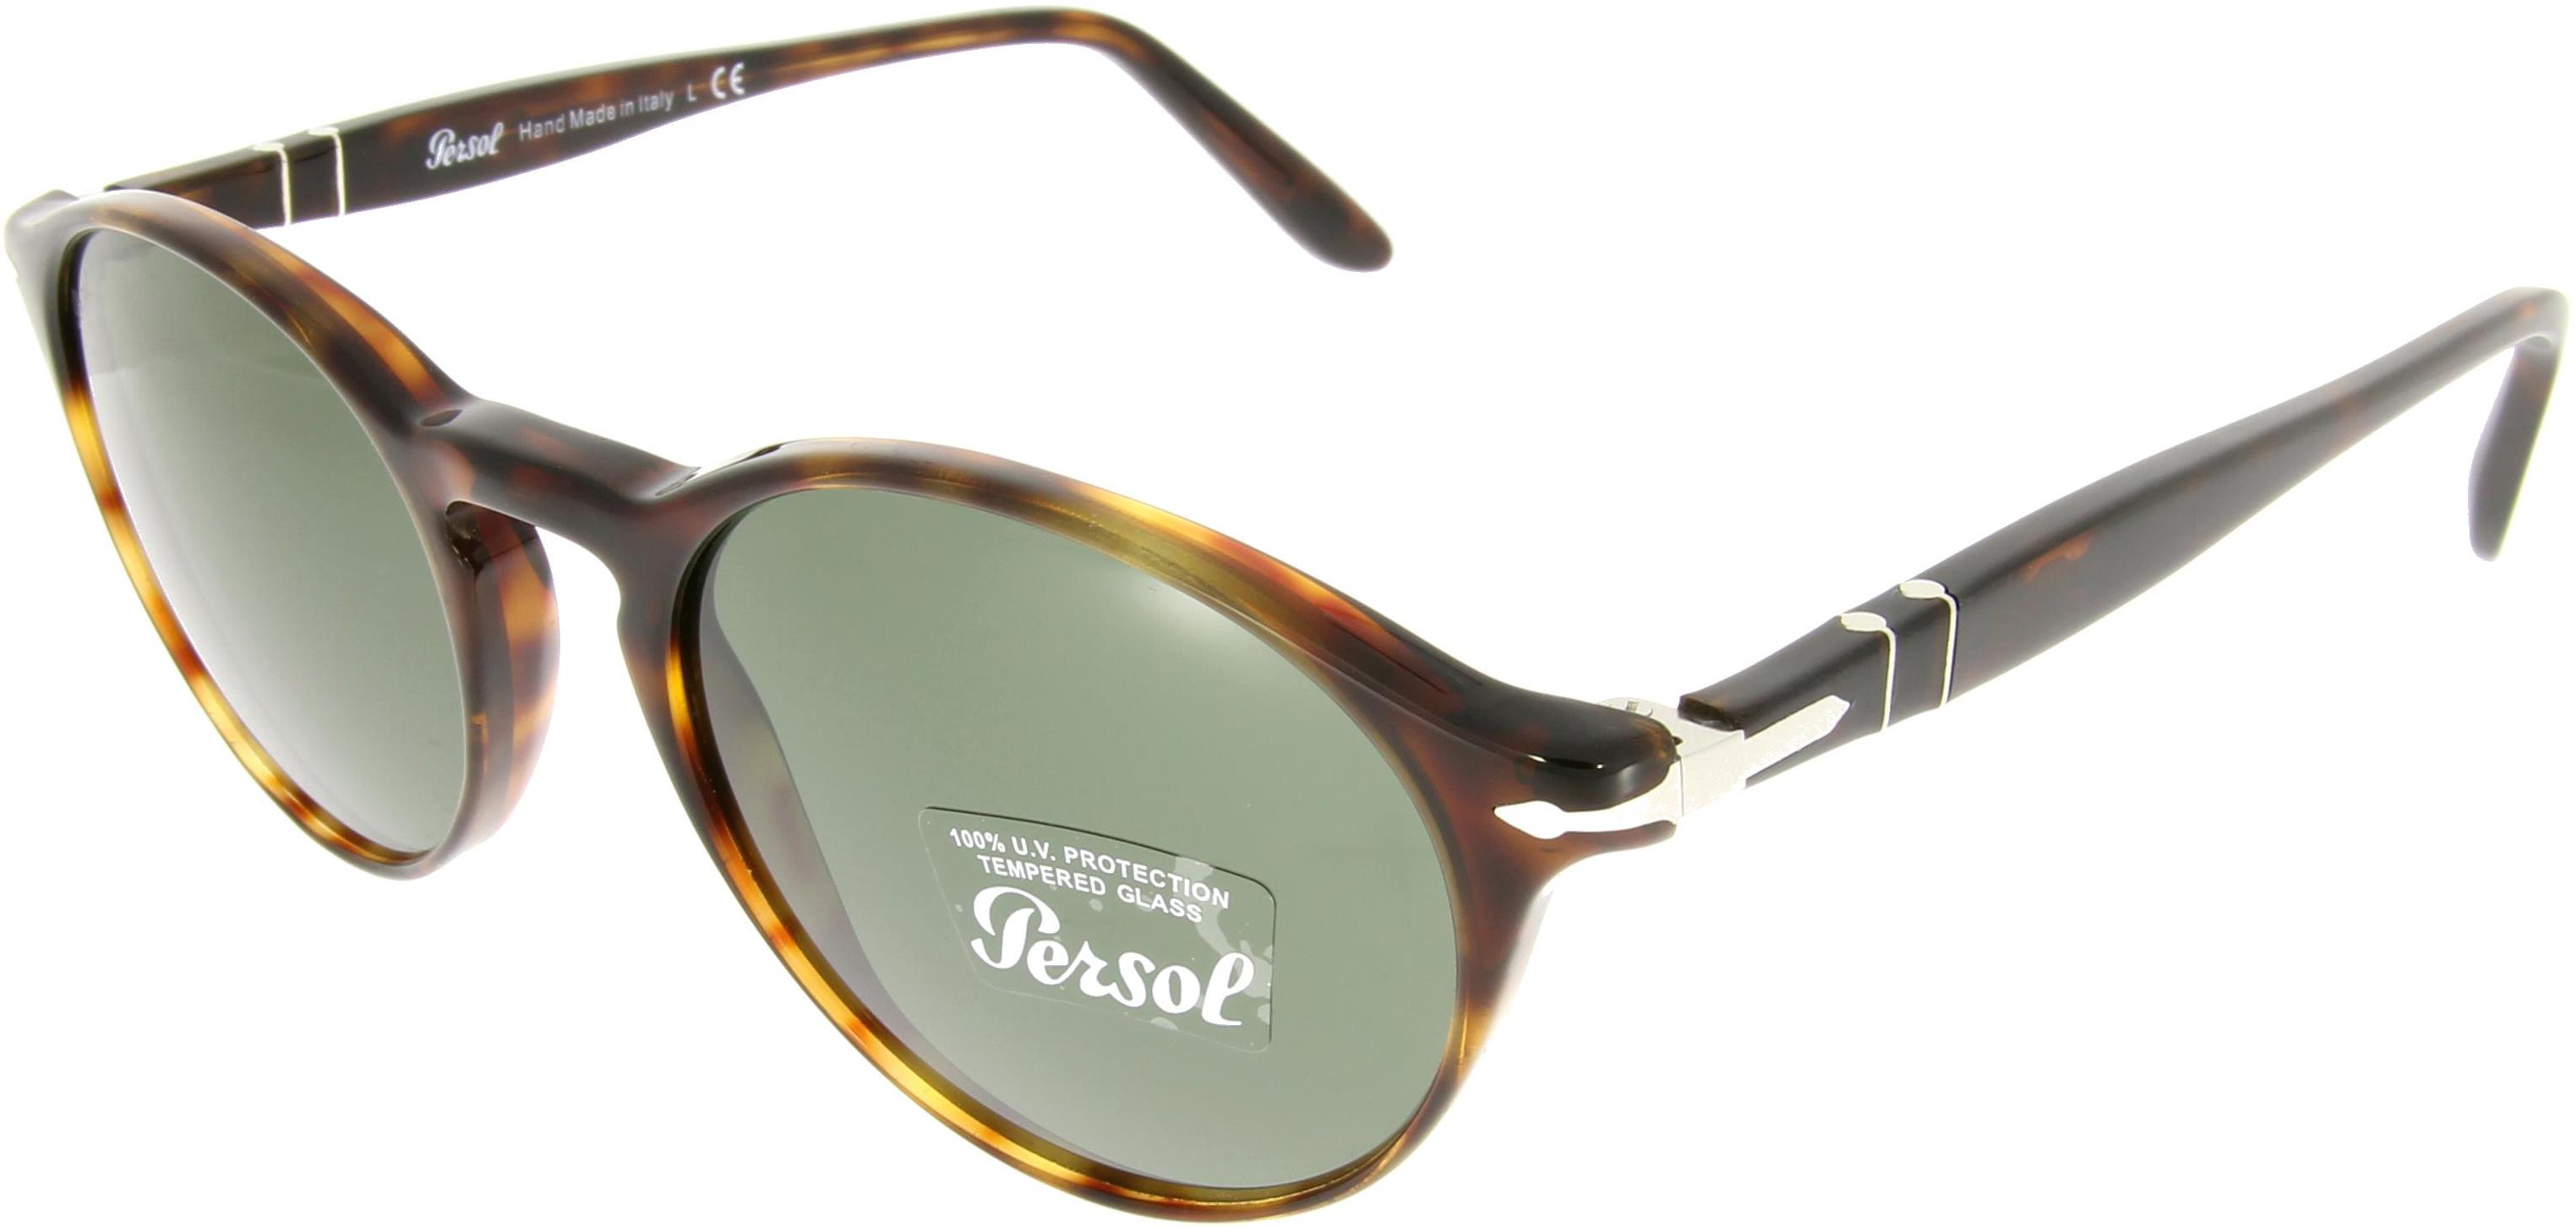 Persol Sonnenbrille PO 3092SM 901531 3N Vollrand